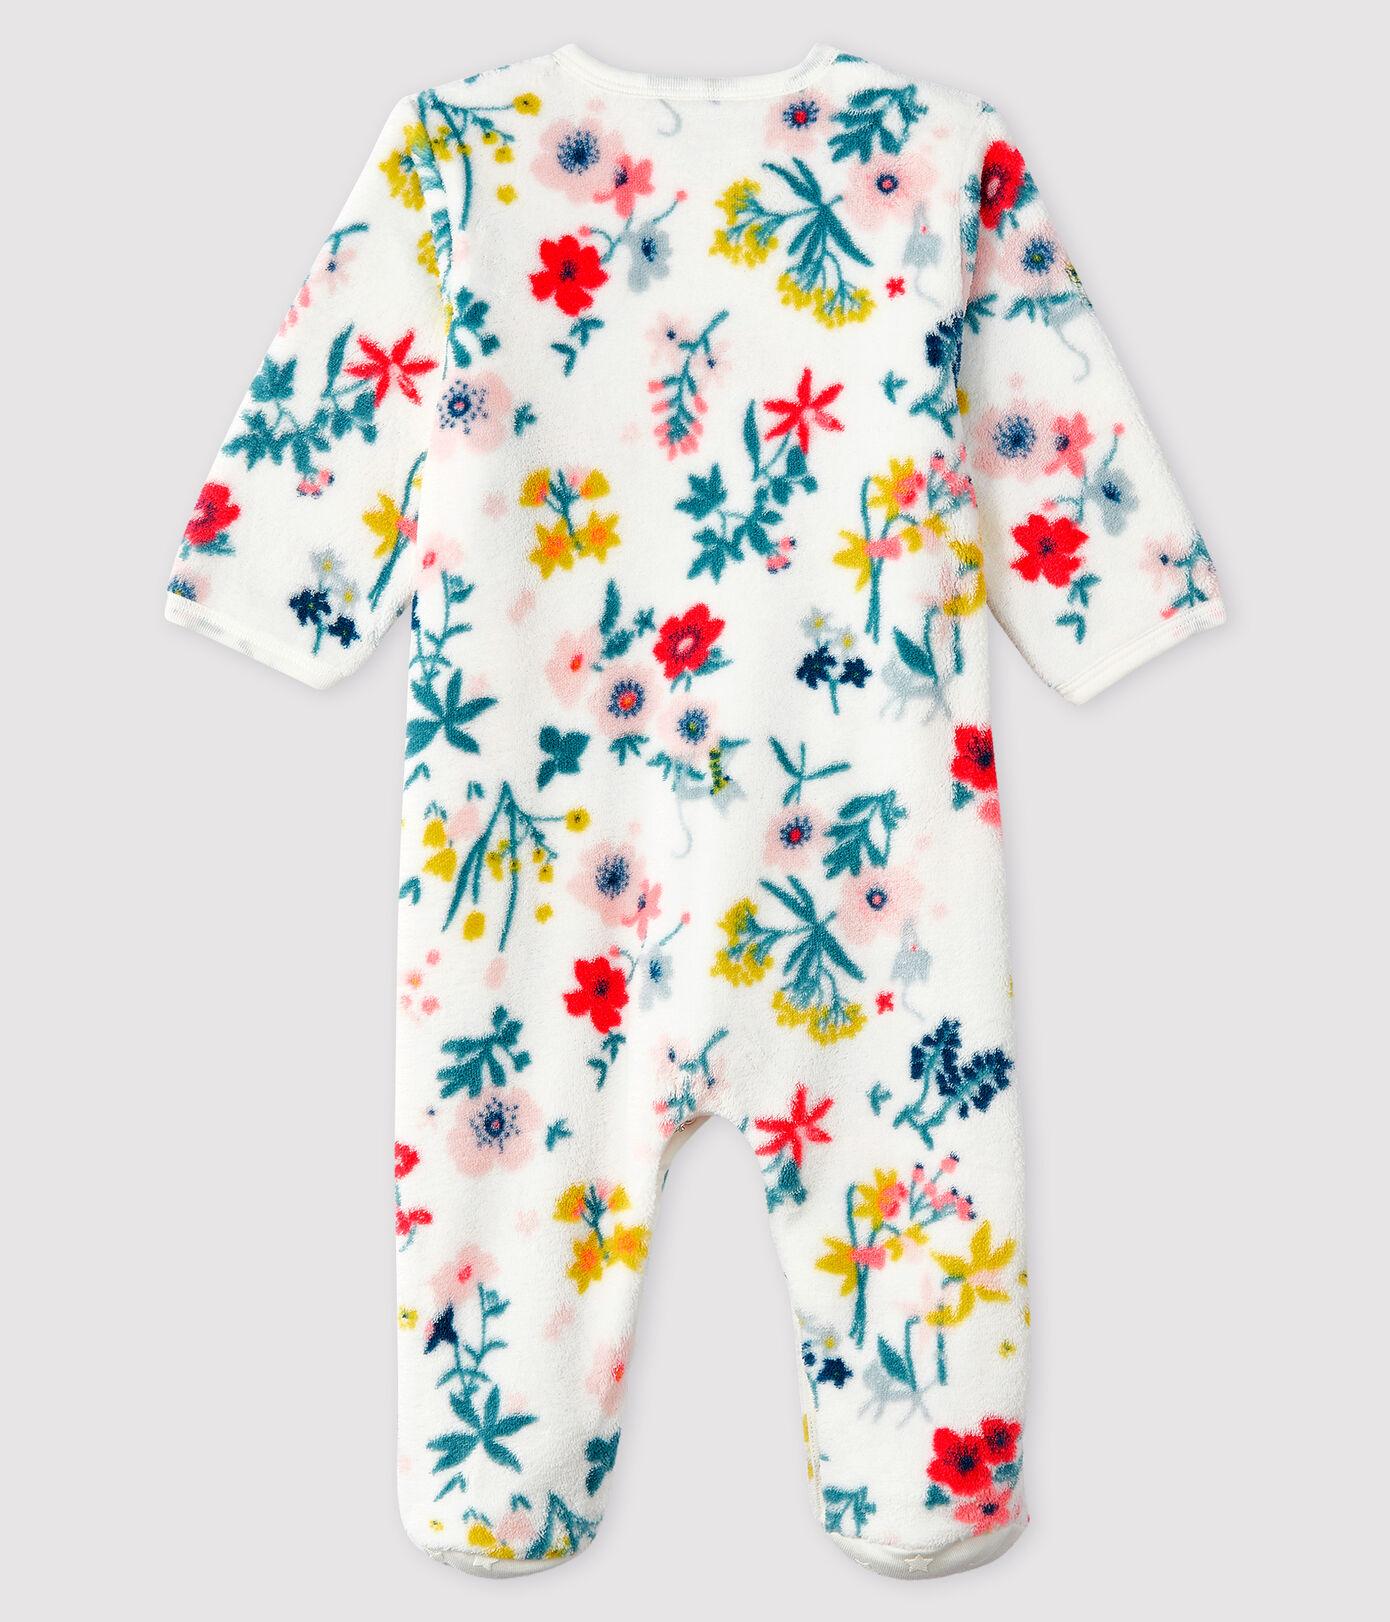 Pyjama met voetjes in fluweel met tutu spirit | Tutu